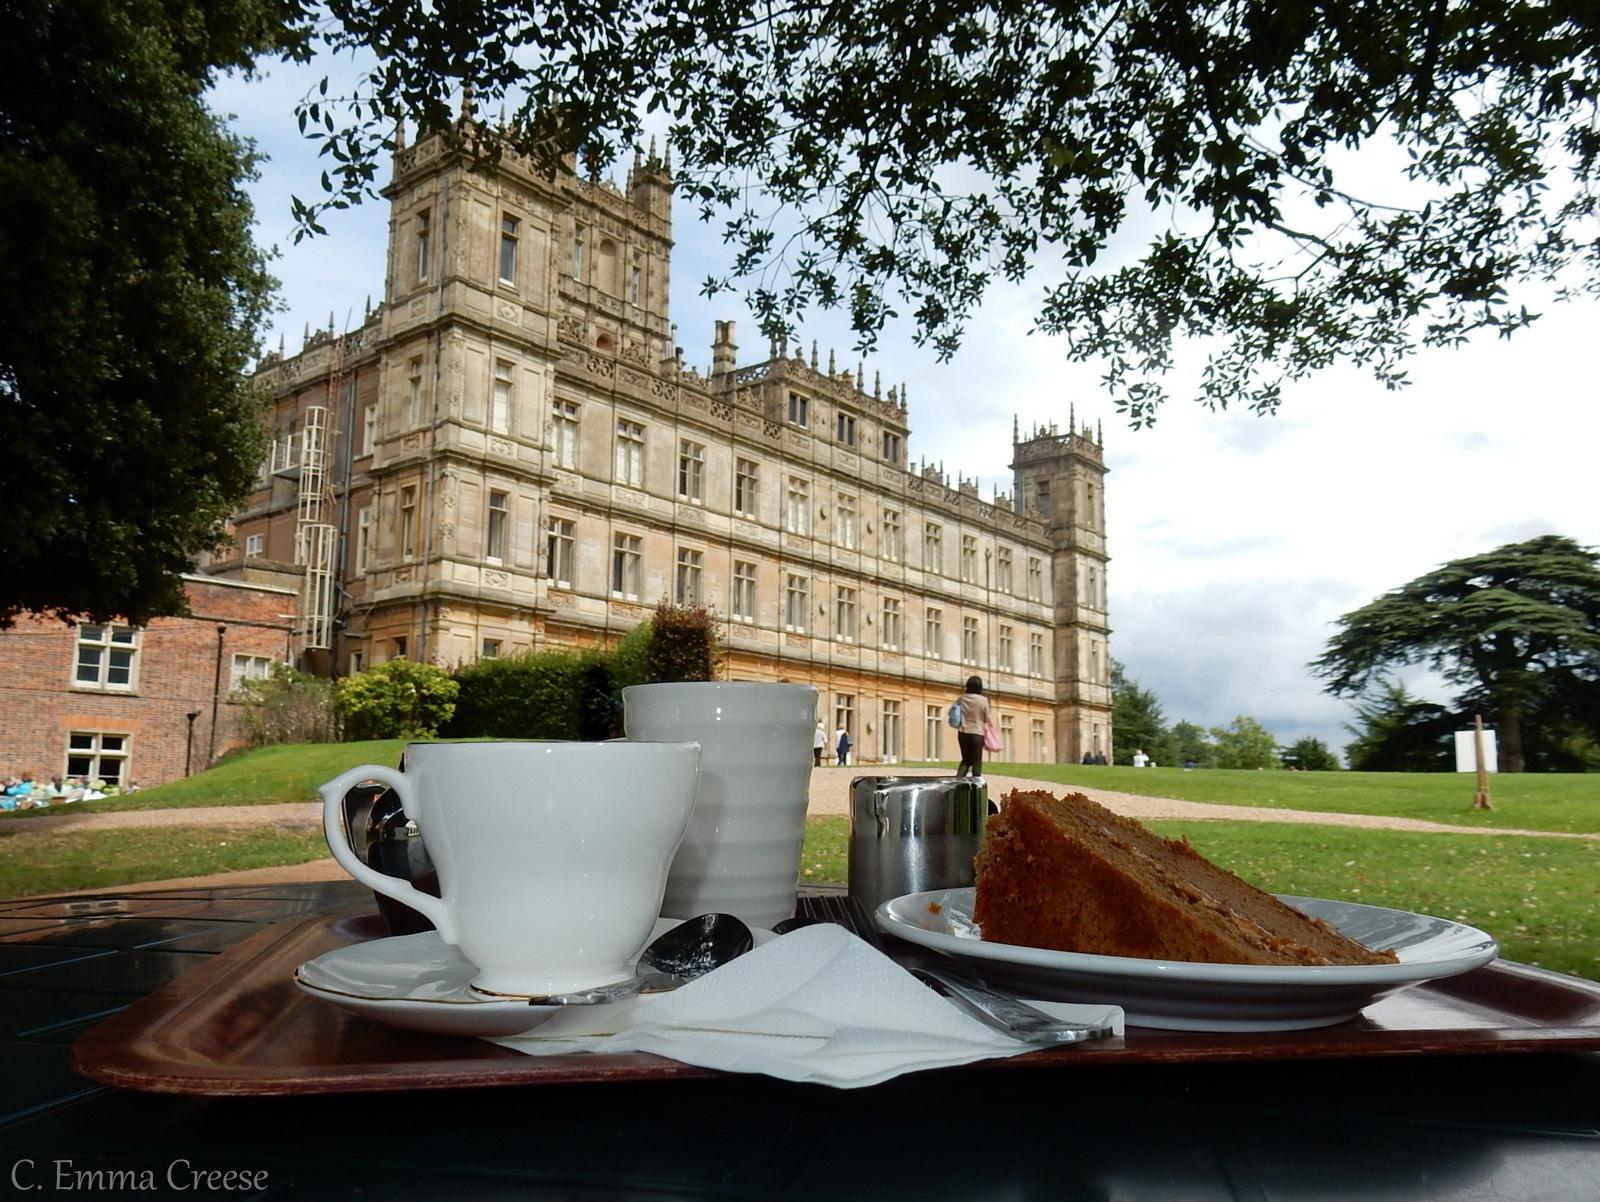 Downton Abbey, Highclere Castle Adventures of a London Kiwi